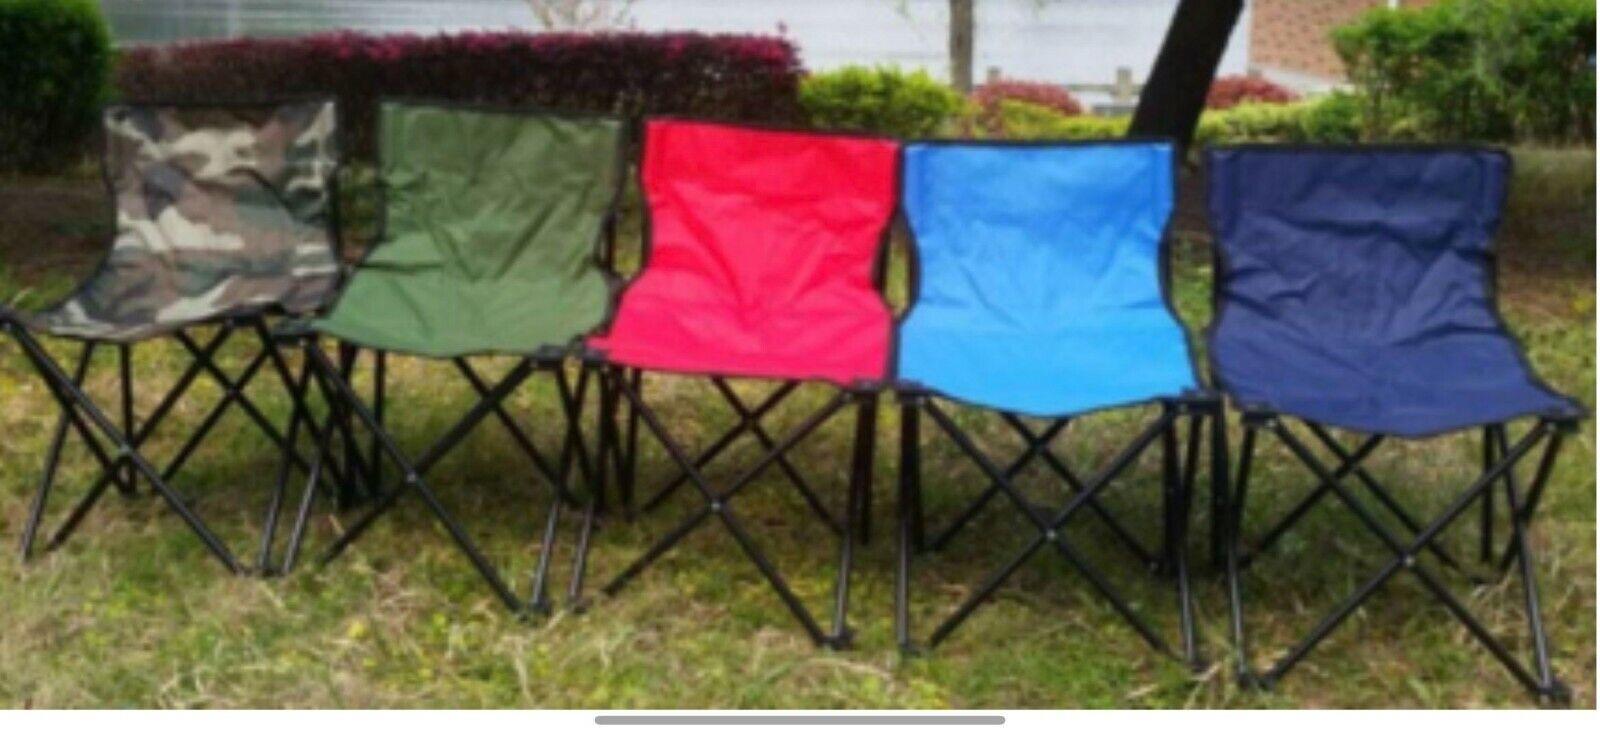 Patio Furniture Folding Camping Chair Beach Seat Fishing Picnic Outdoor BBQ Chairs & Seats